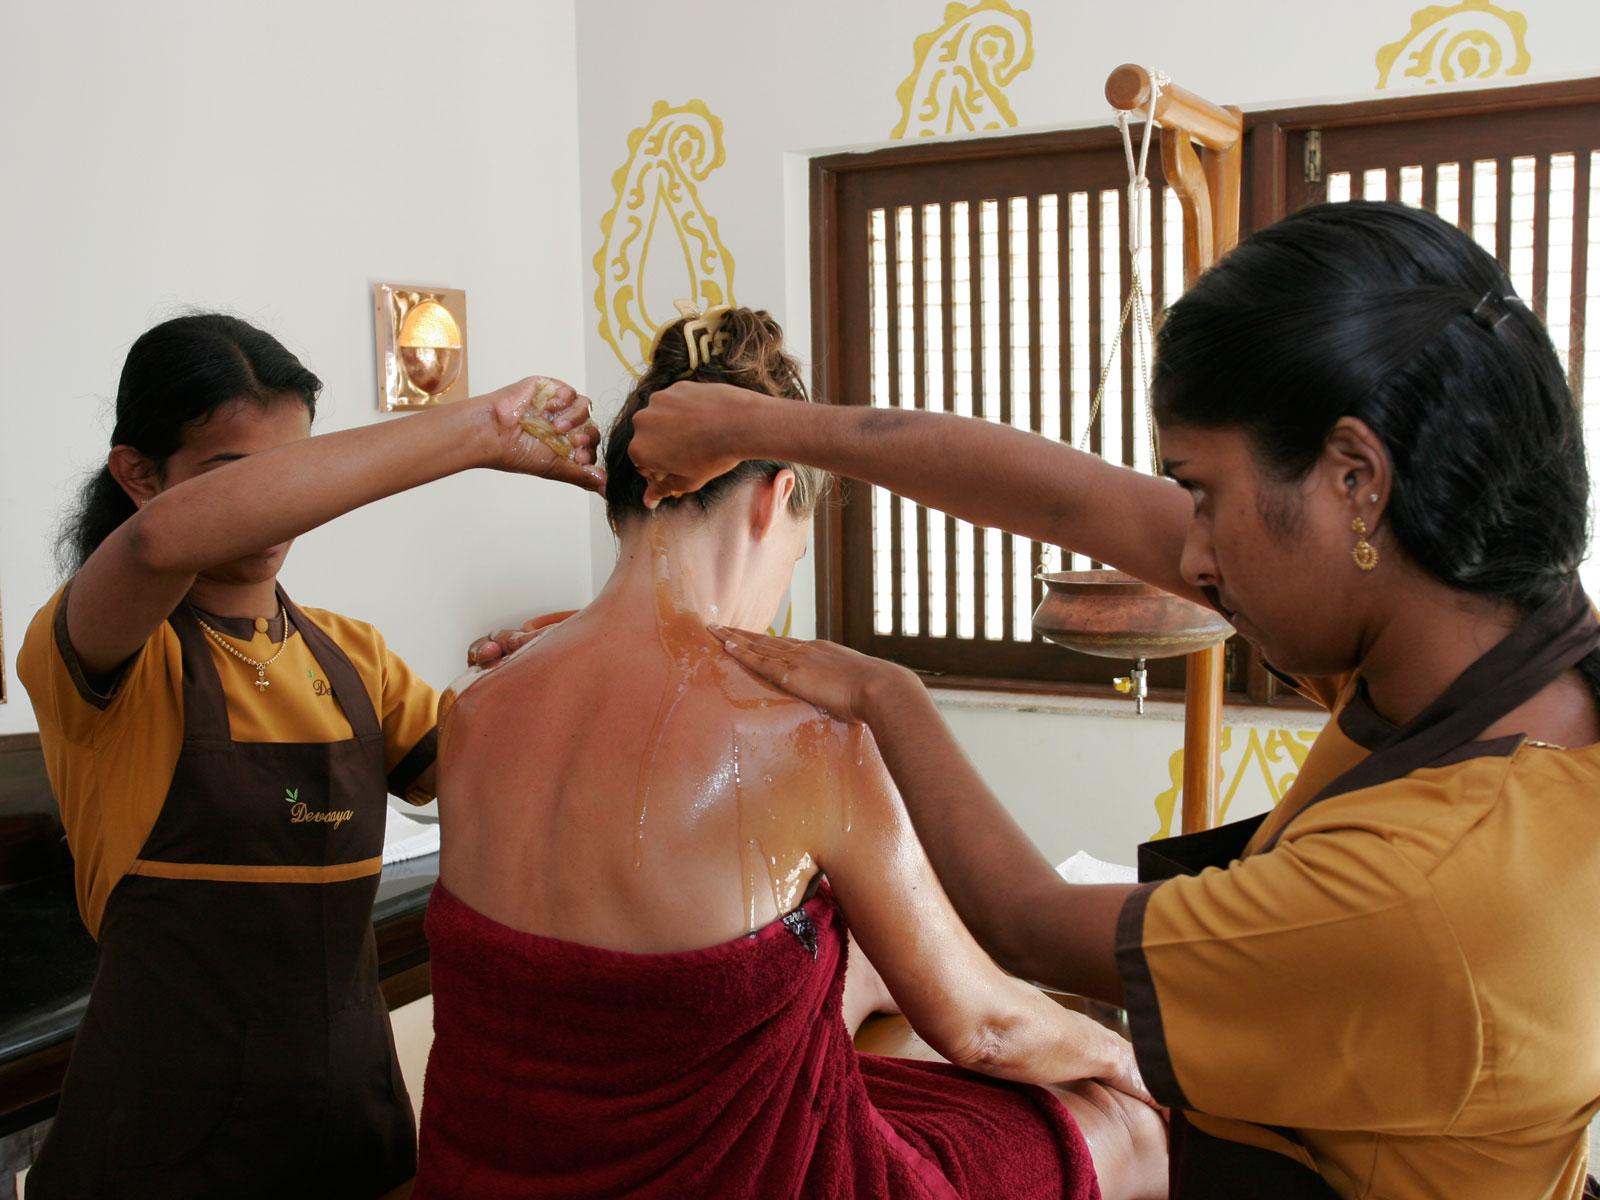 indien-goa-devaaya-ayurveda-behandlung.jpg